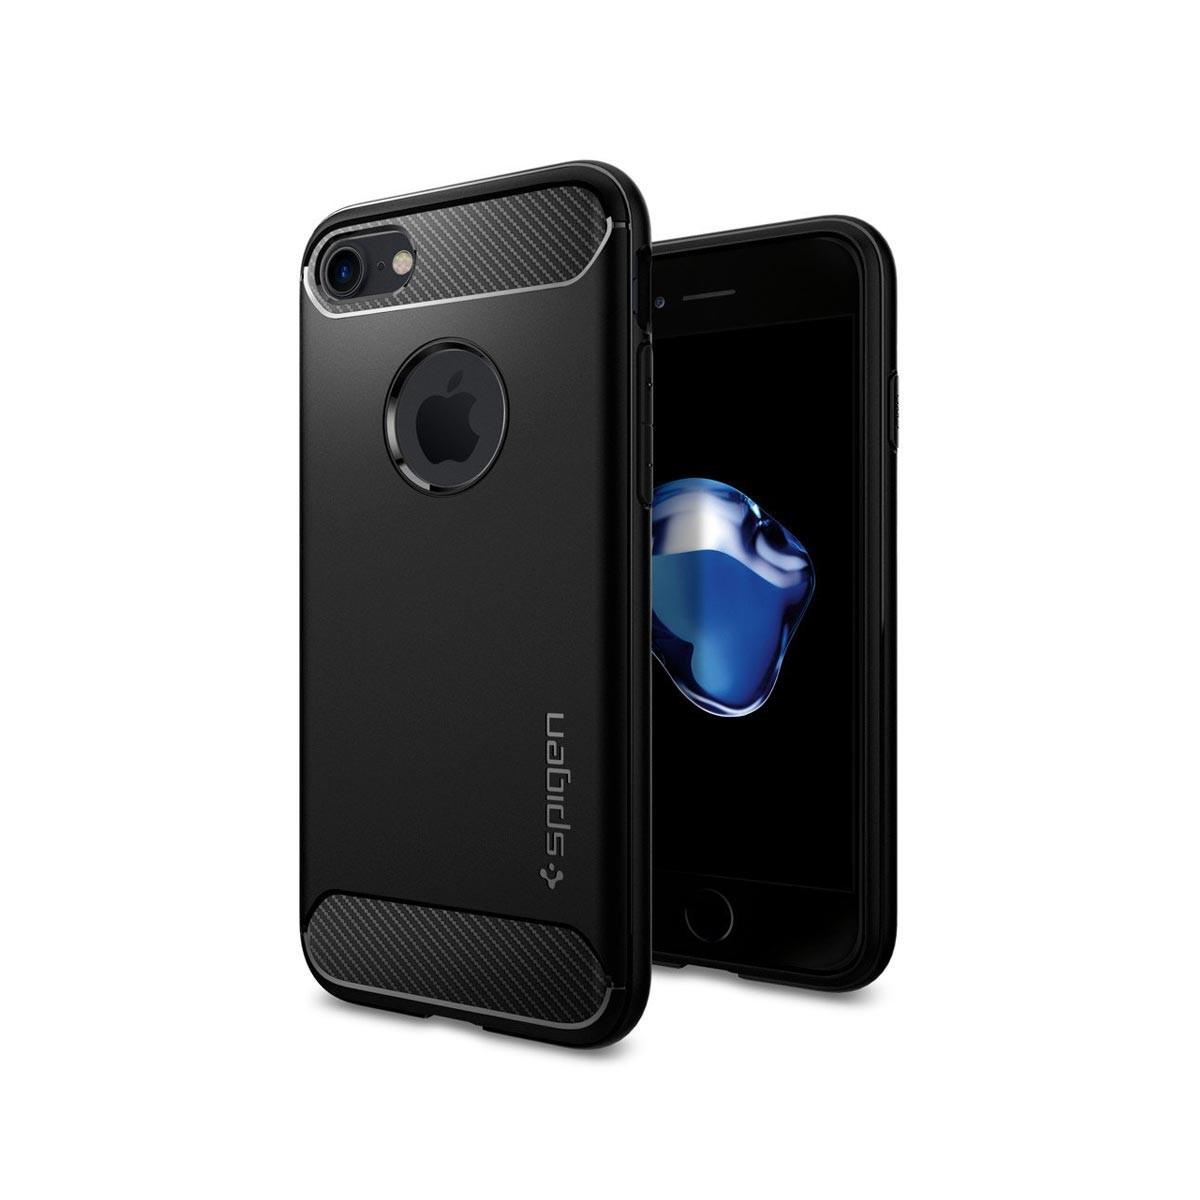 Kryt na iPhone 7 Spigen Rugged Armor - černý